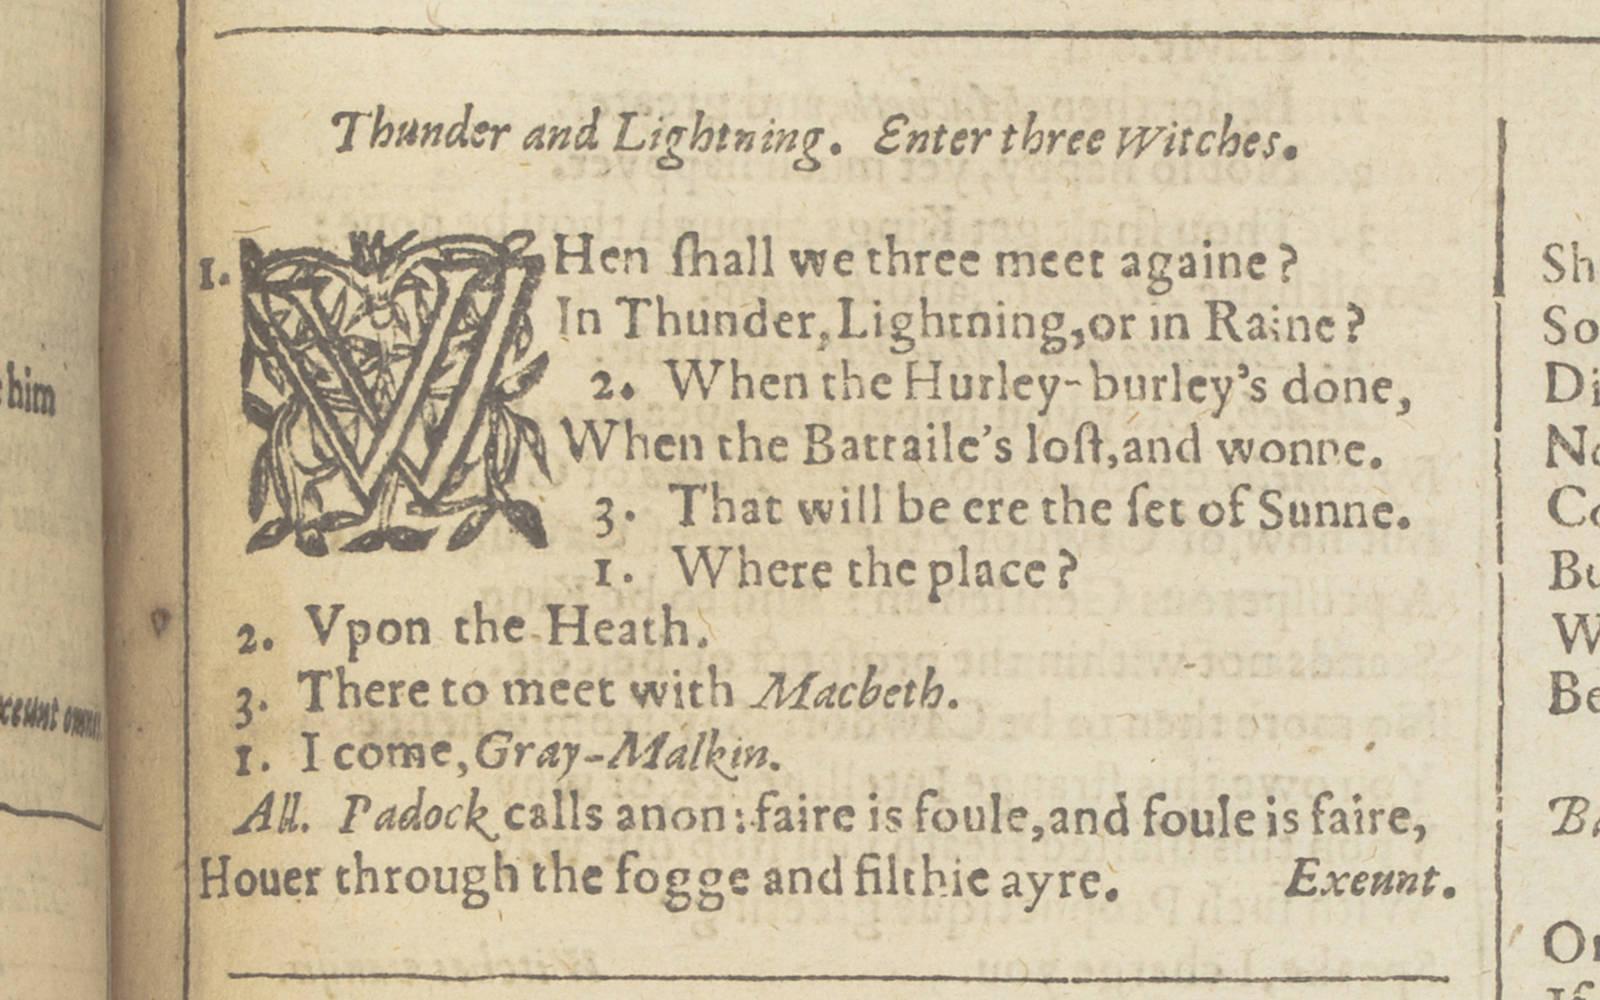 Mr. William Shakespeare's Comedies, Histories, & Tragedies, 1623